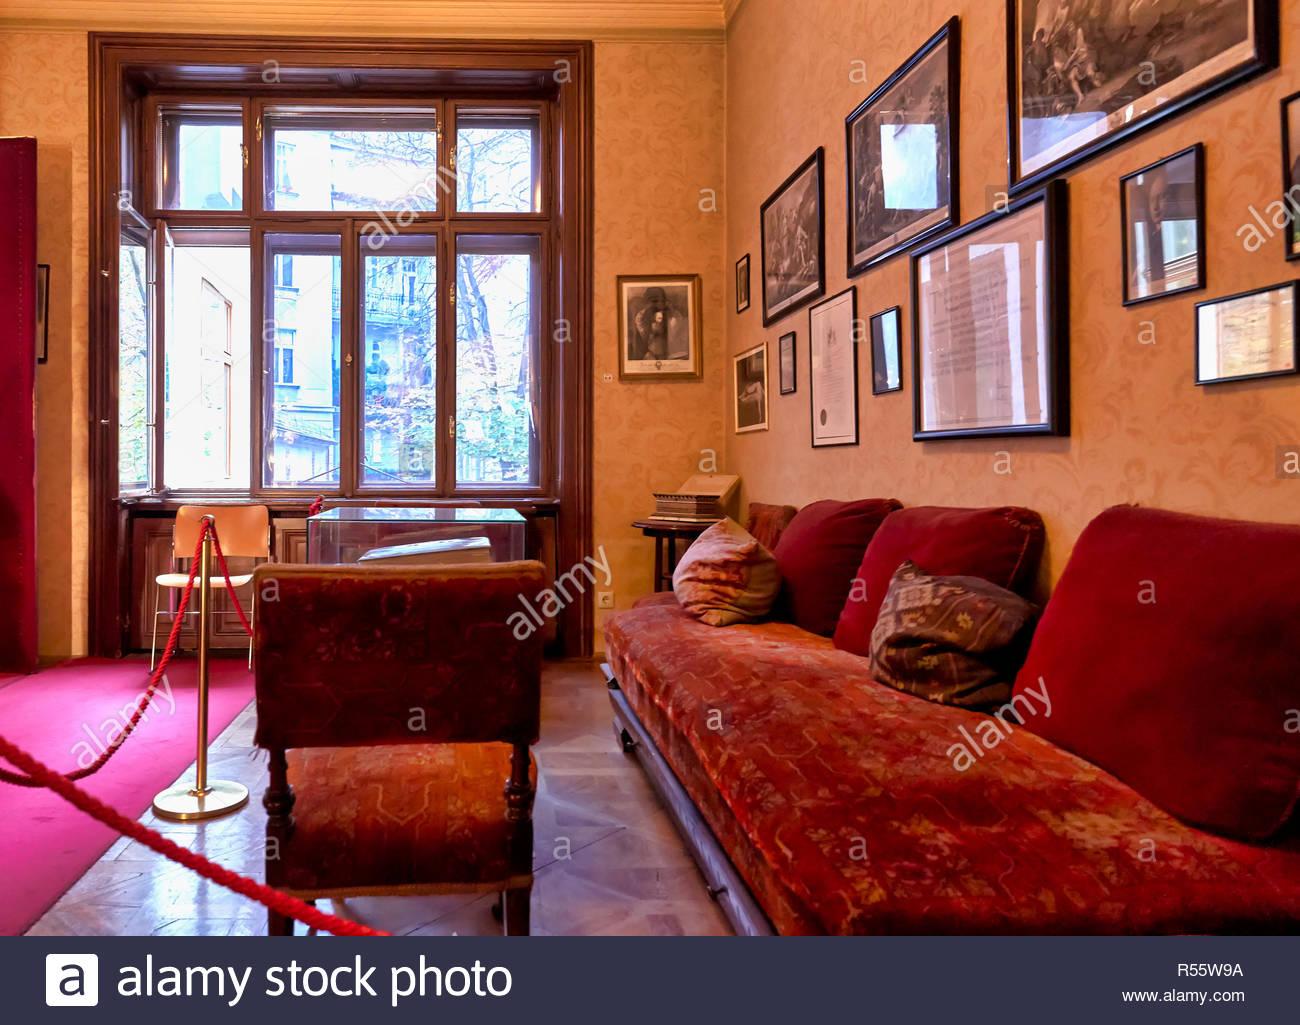 Professor Doctor Freud House Studio in Vienna Austria. The waiting room - Stock Image